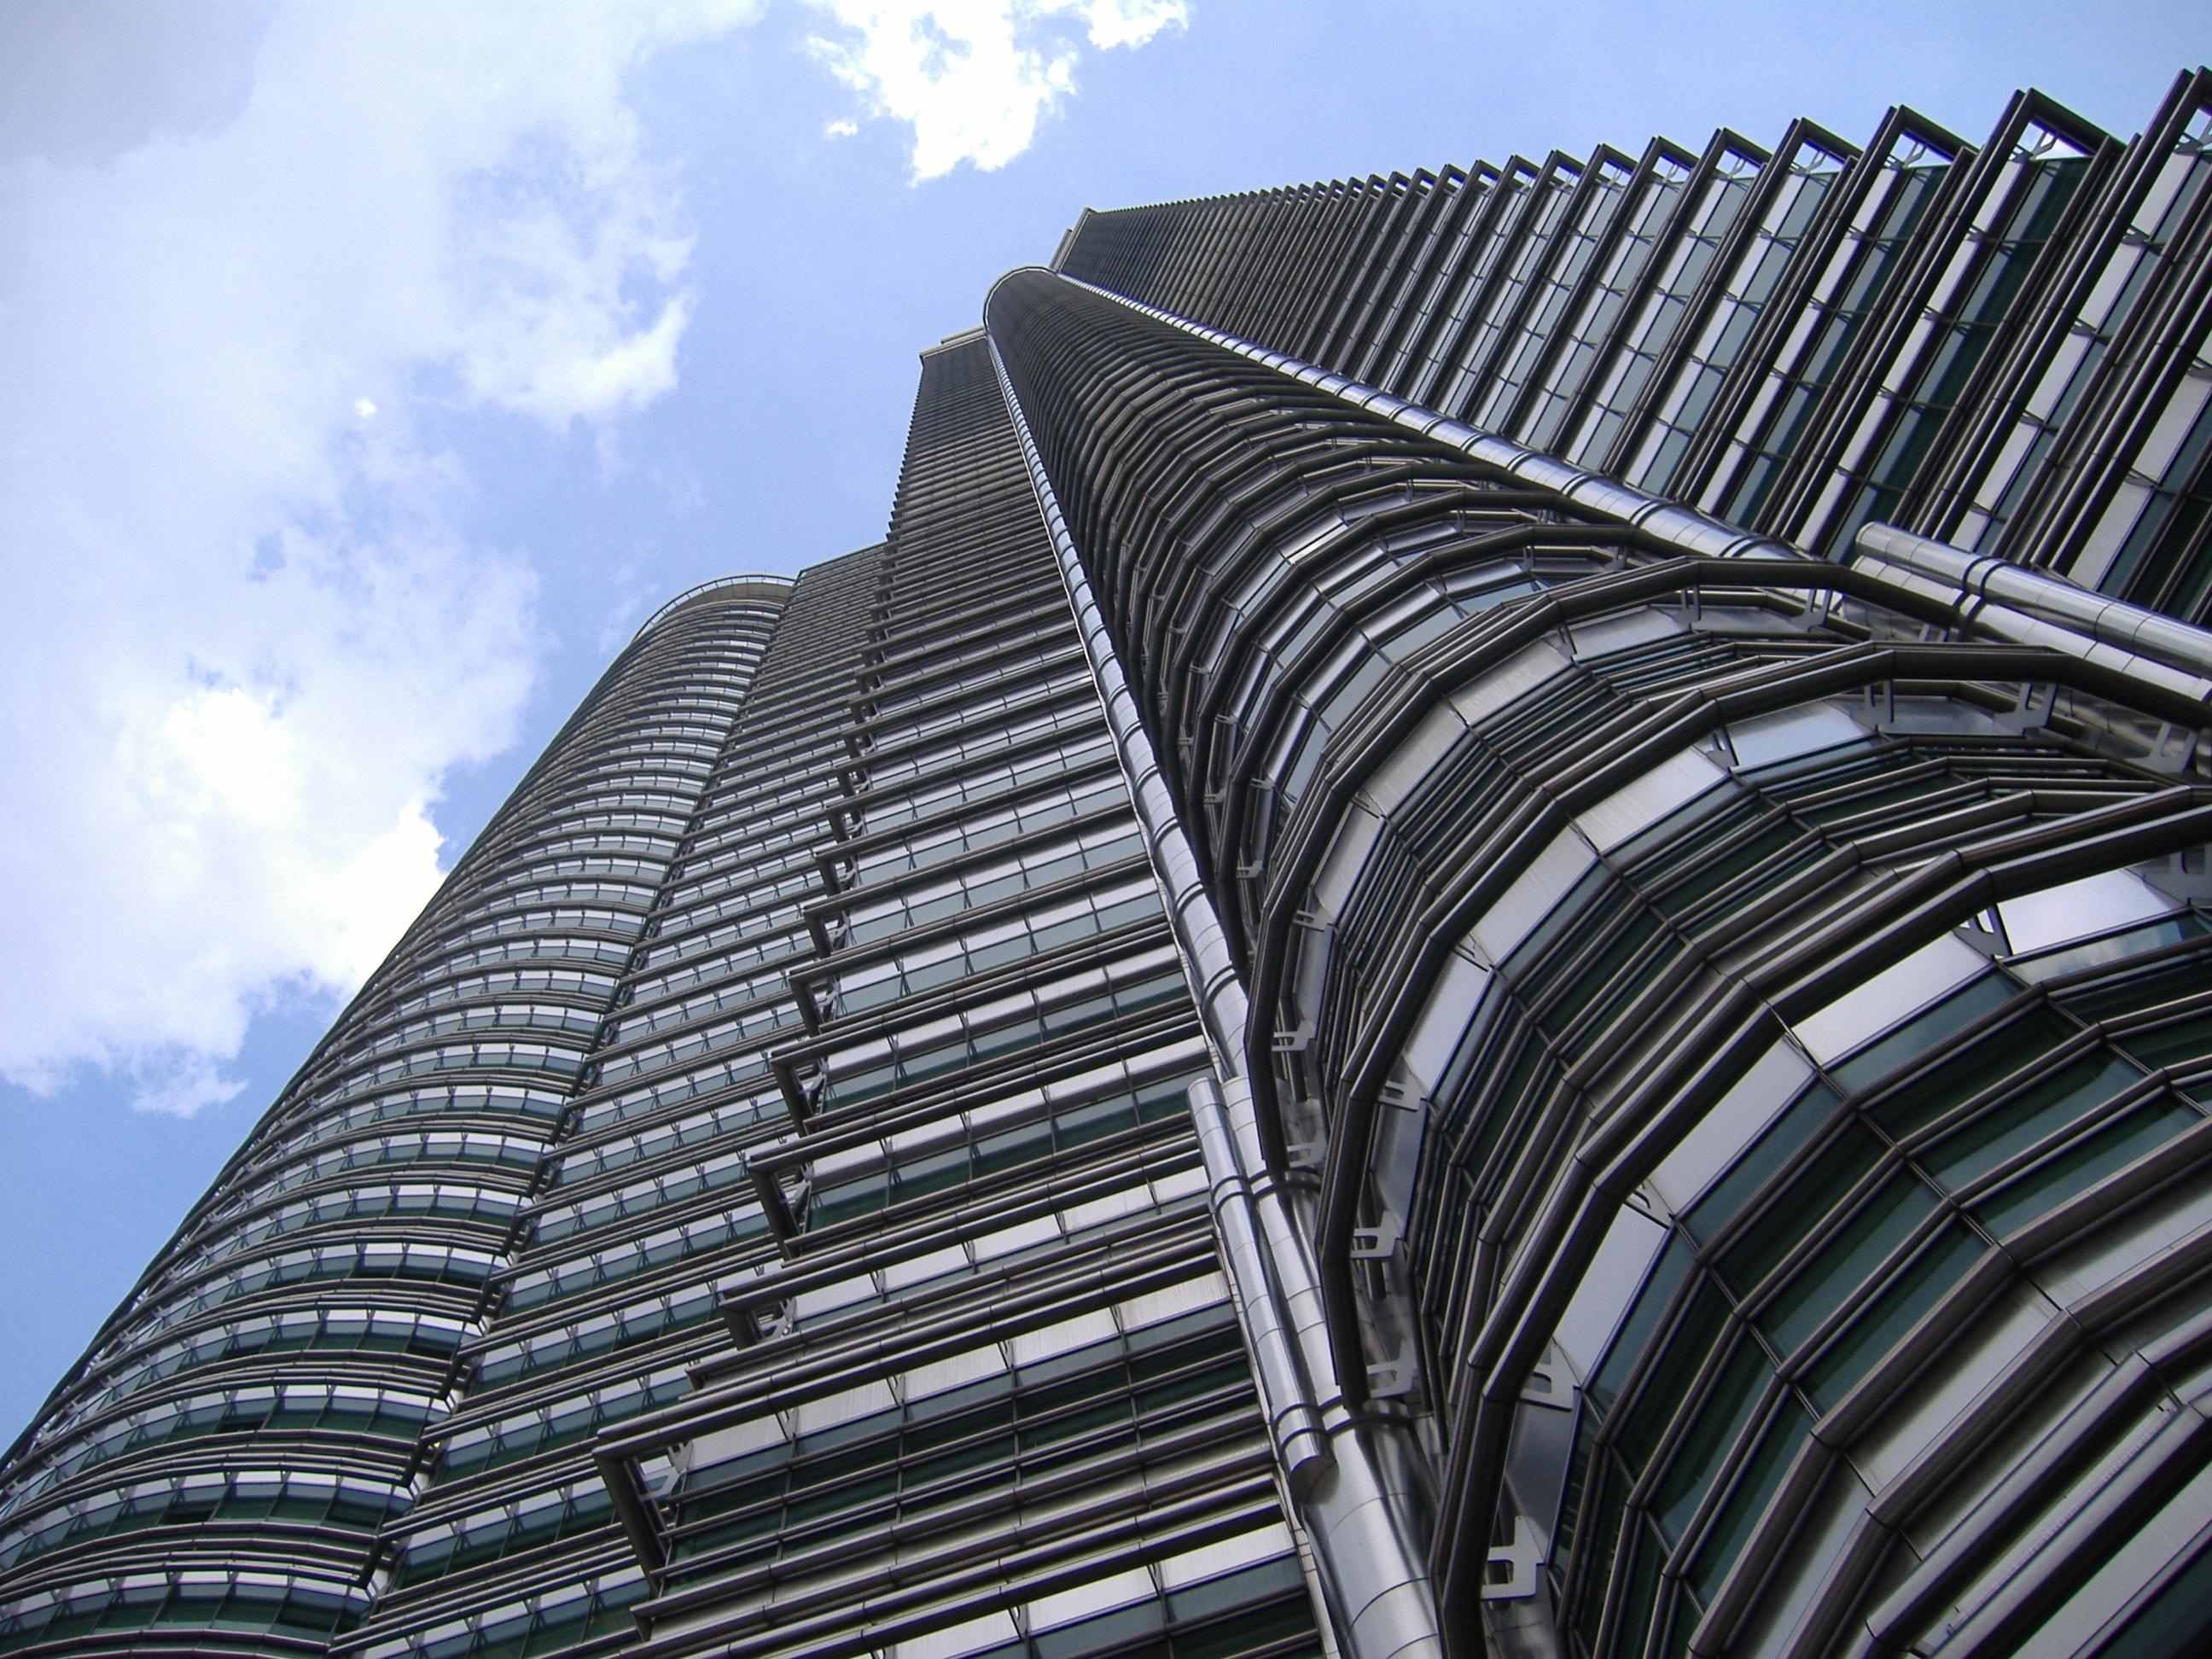 Free photo: Petronas Twin Towers - Architecture